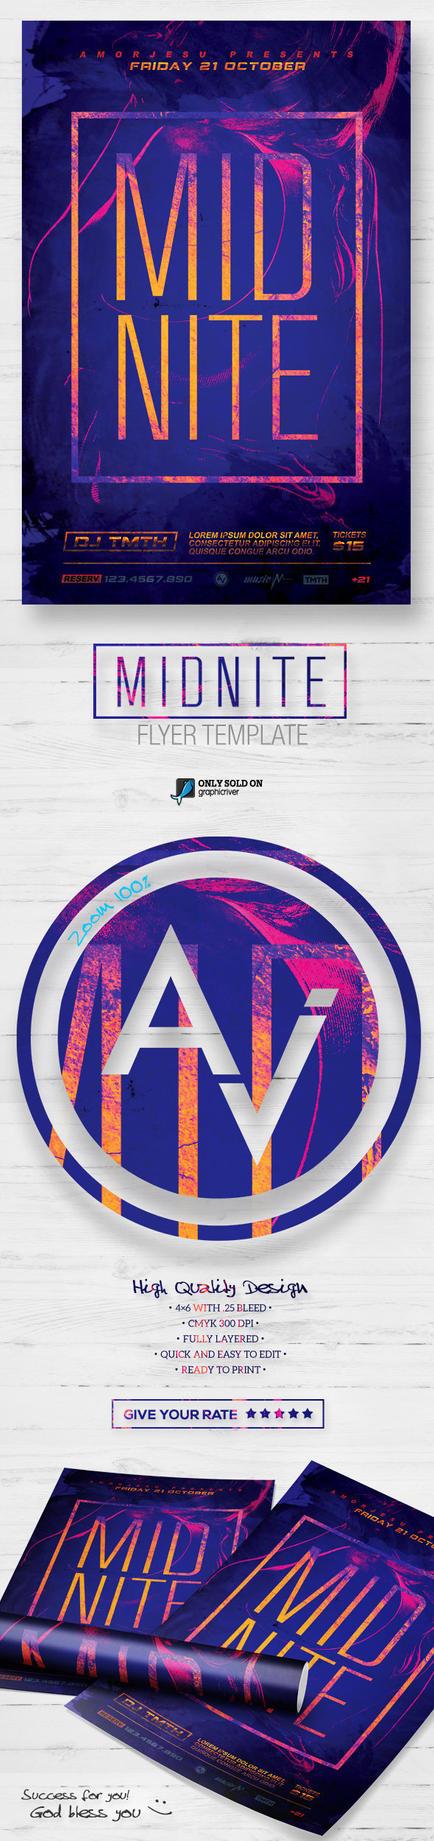 Midnite Flyer Template by amorjesu